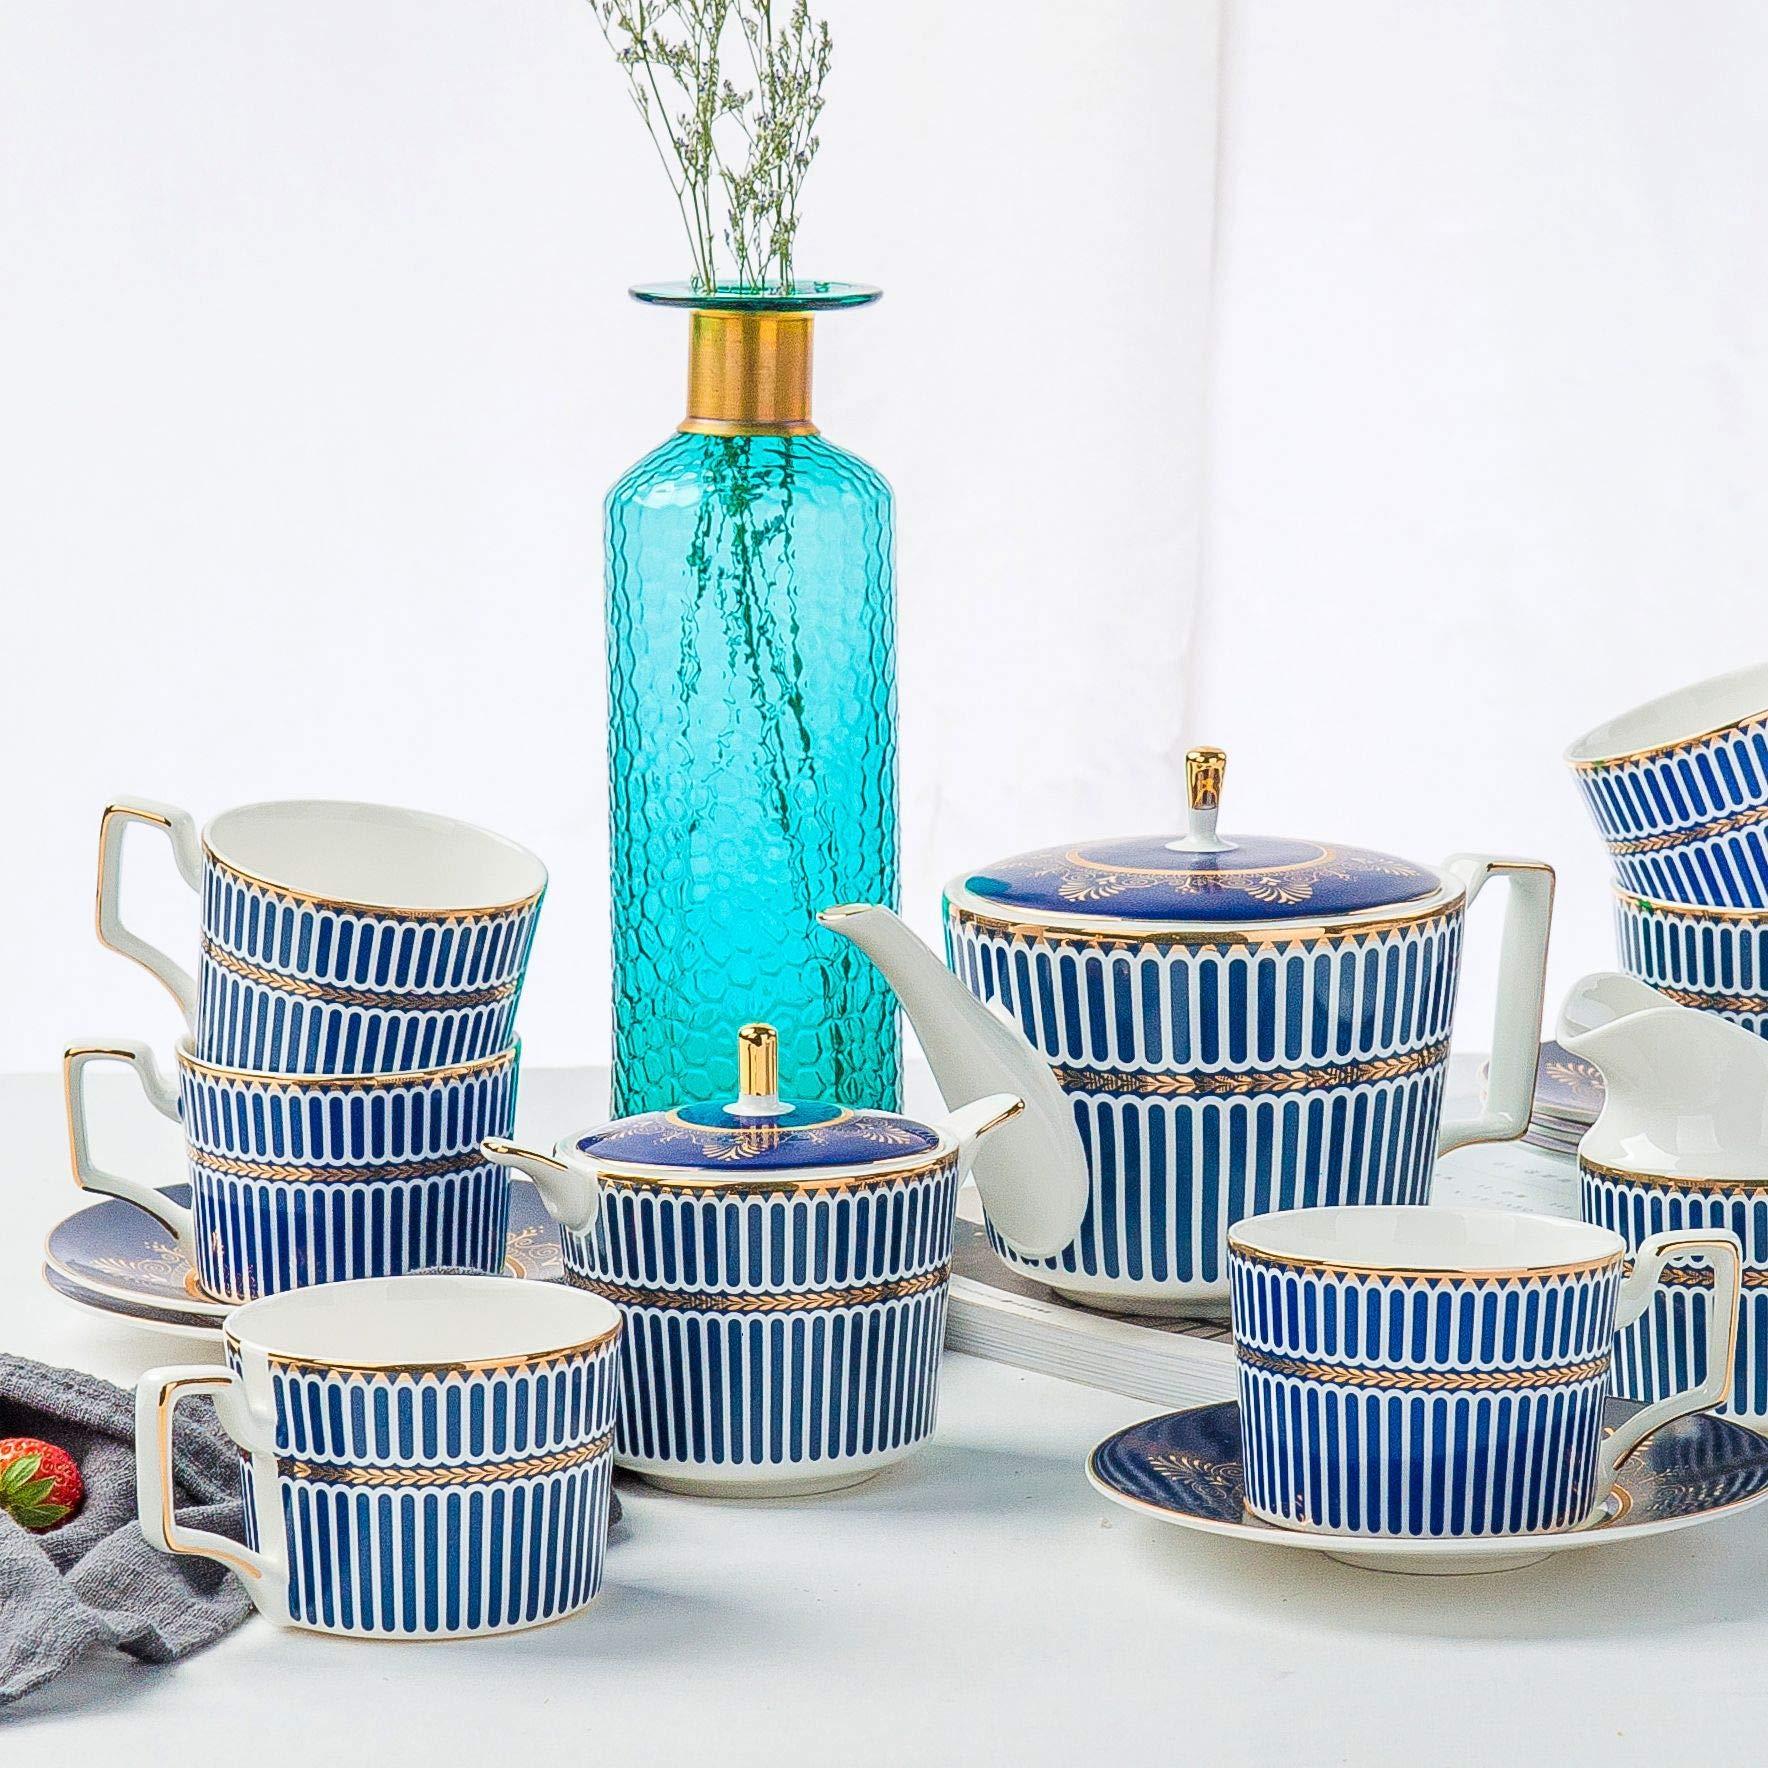 ACHKL European bone china coffee set blue dream royal coffee cup gift ceramic afternoon cup ACHKL